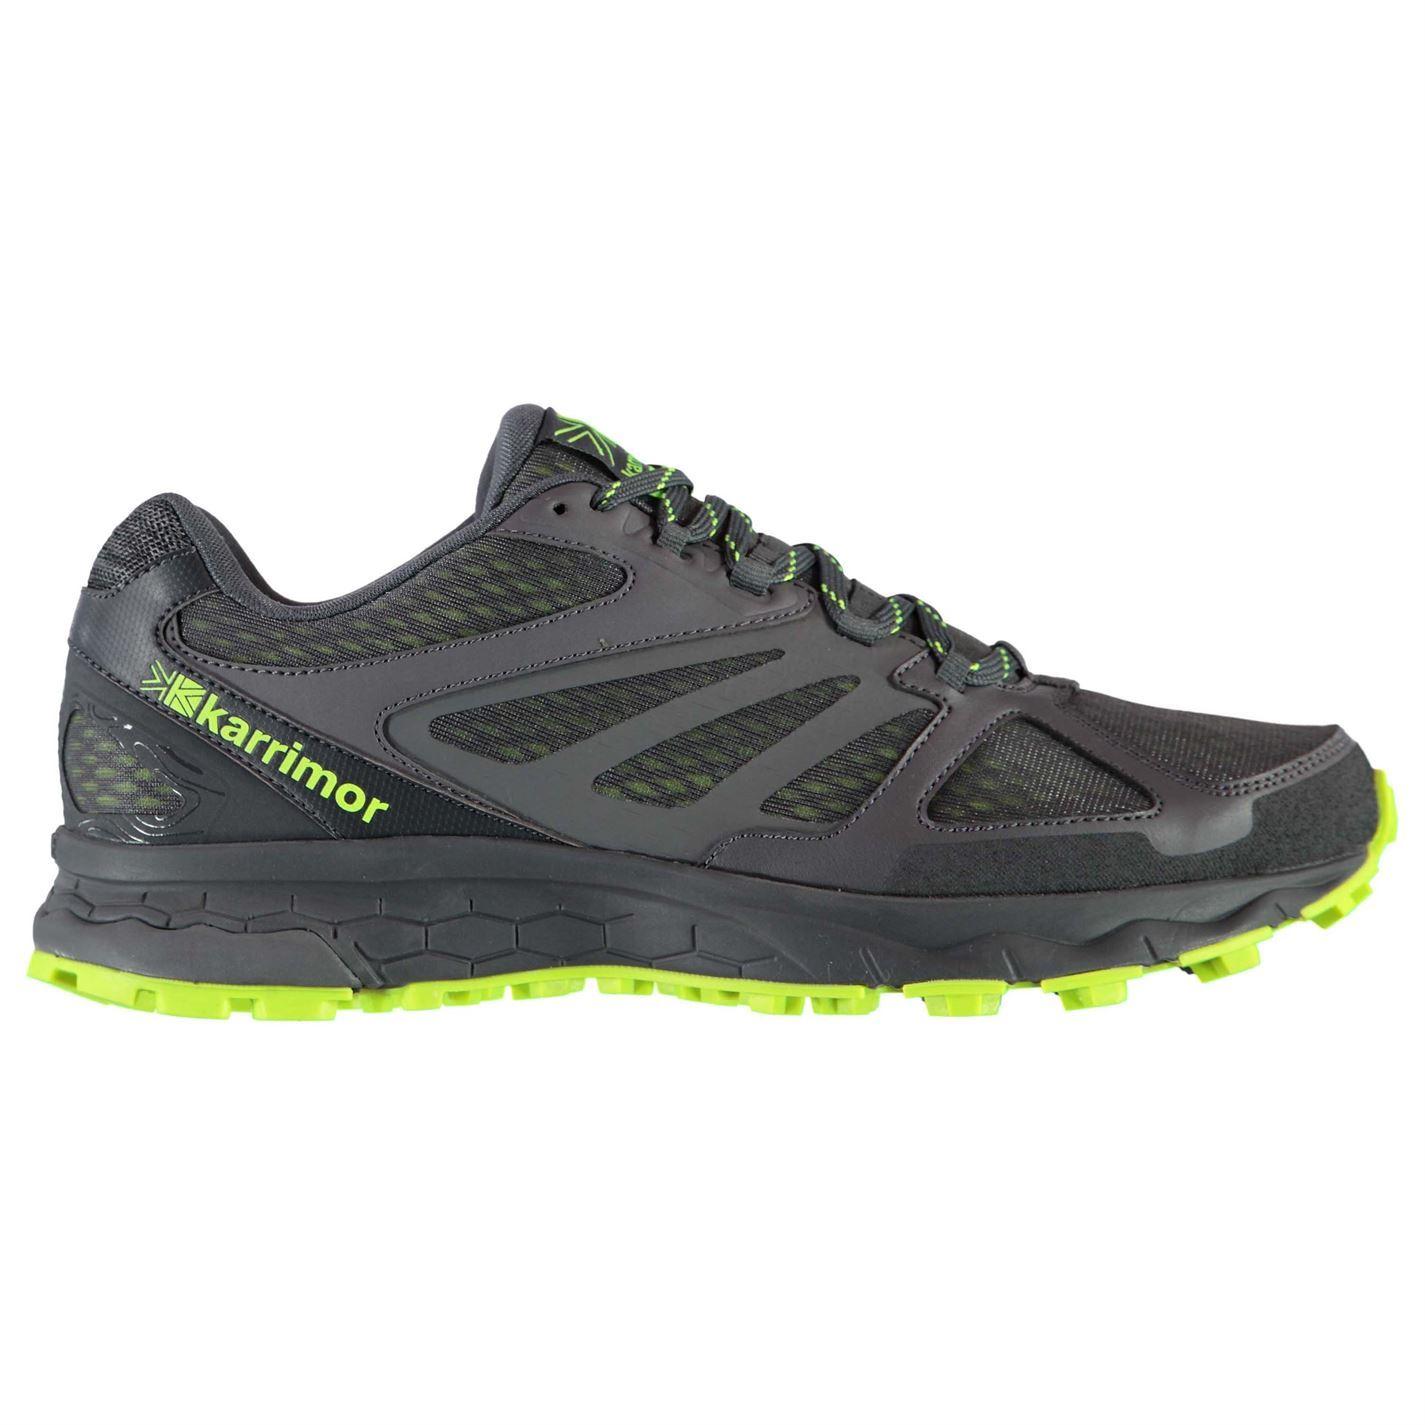 KARRIMOR Duma Sneaker Scarpe da Ginnastica da Donna Scarpe Da Corsa Trainers Fitness 4077